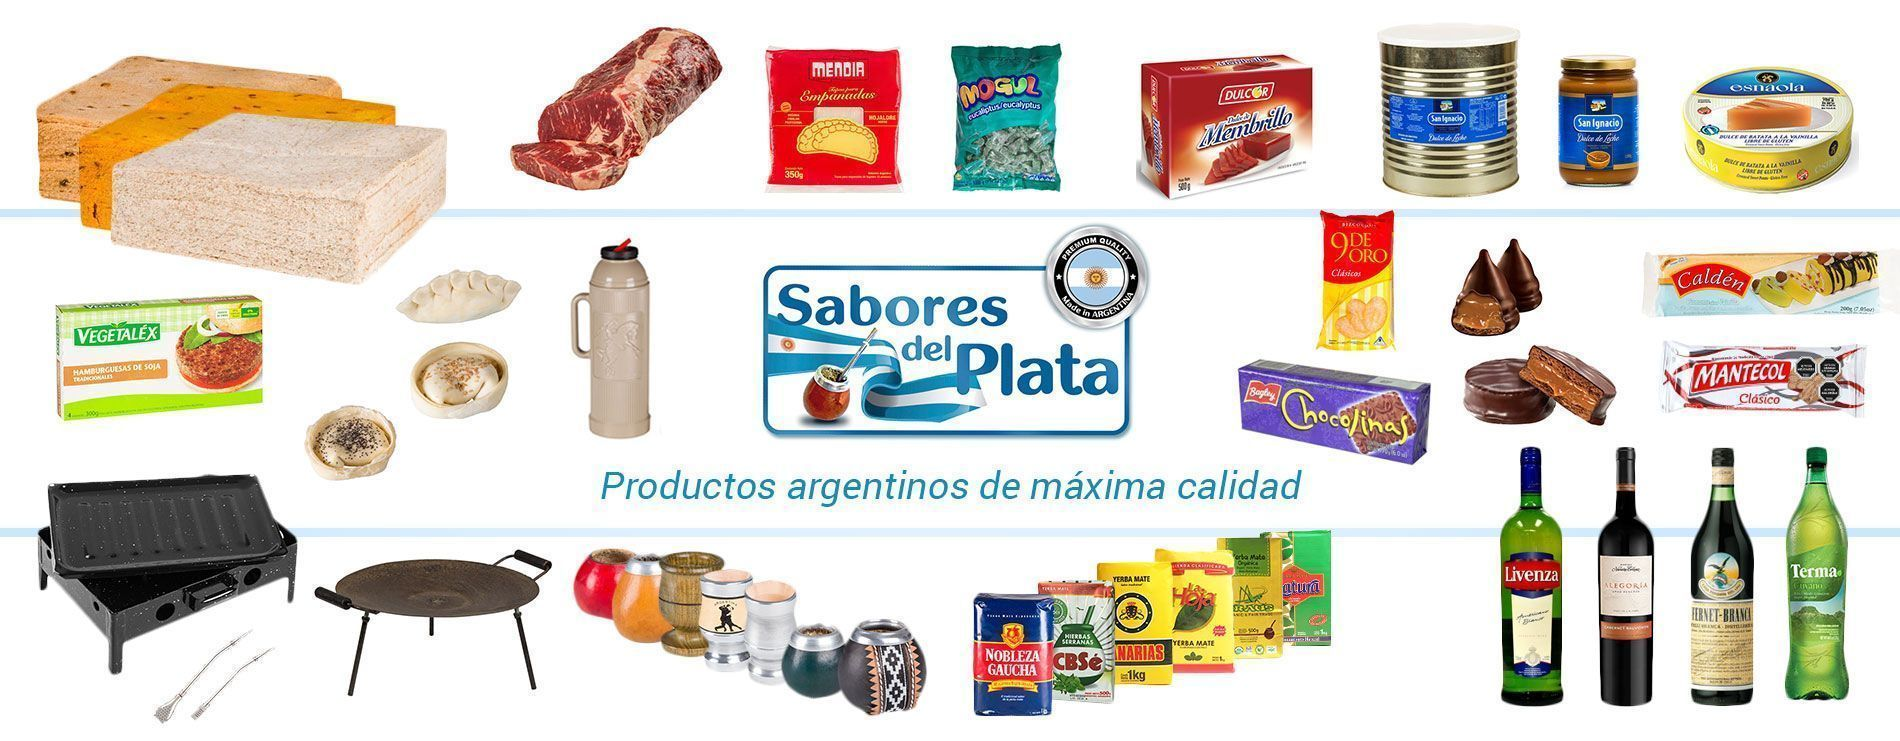 productos-argentinos-espana